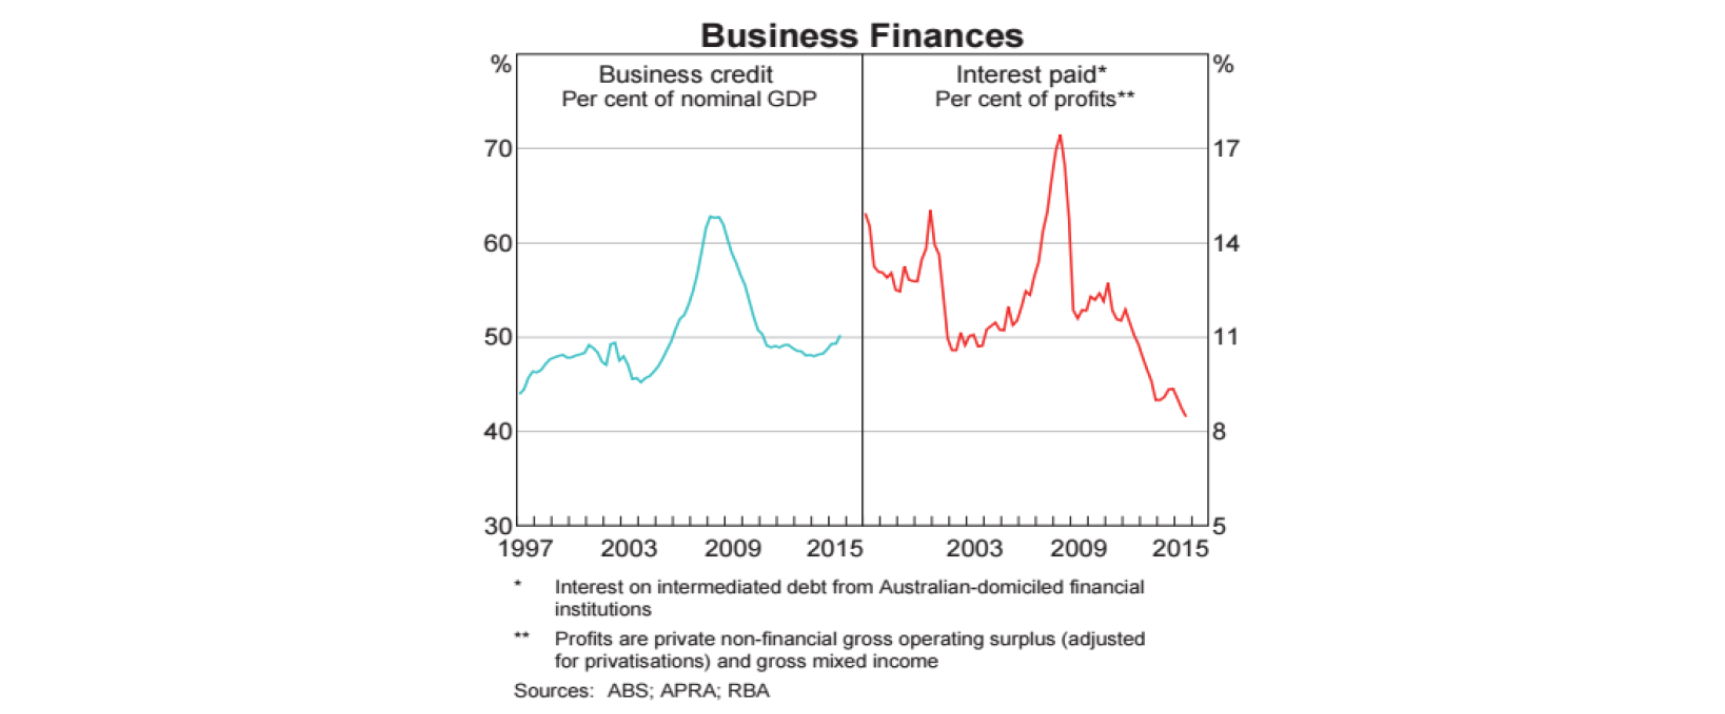 Chart 6: Business finances*